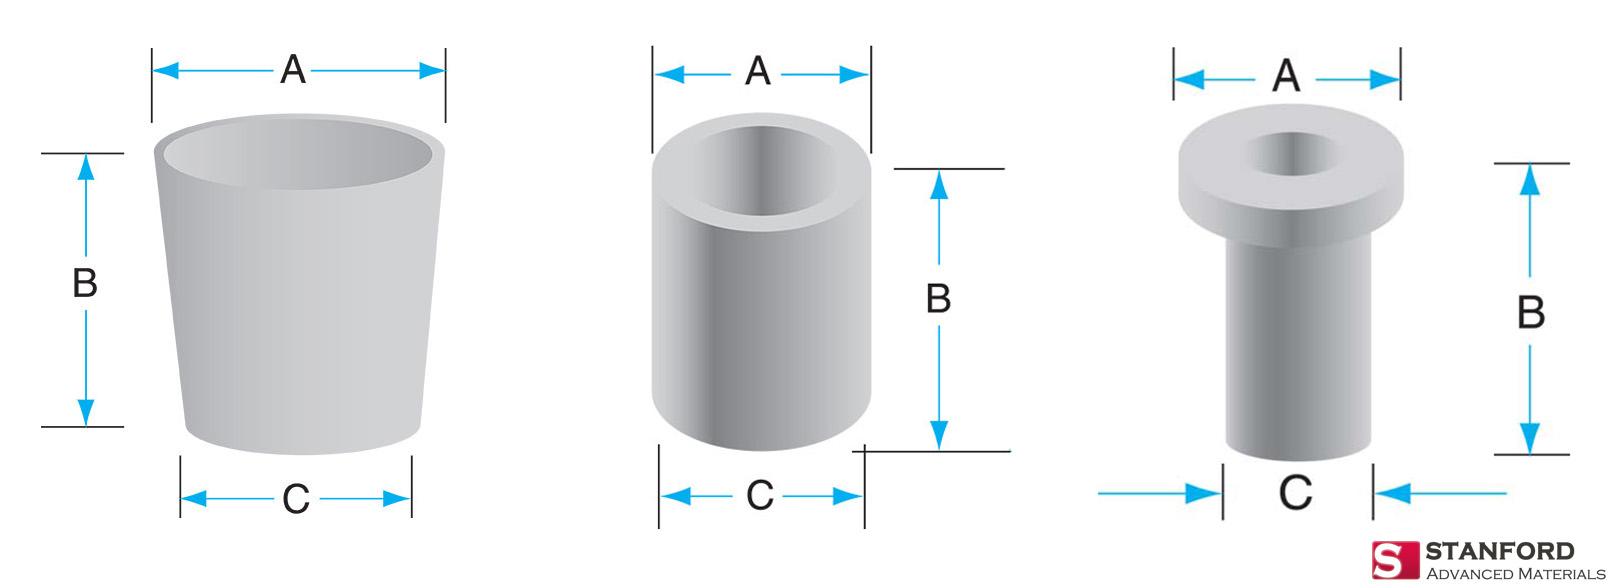 crucible shapes